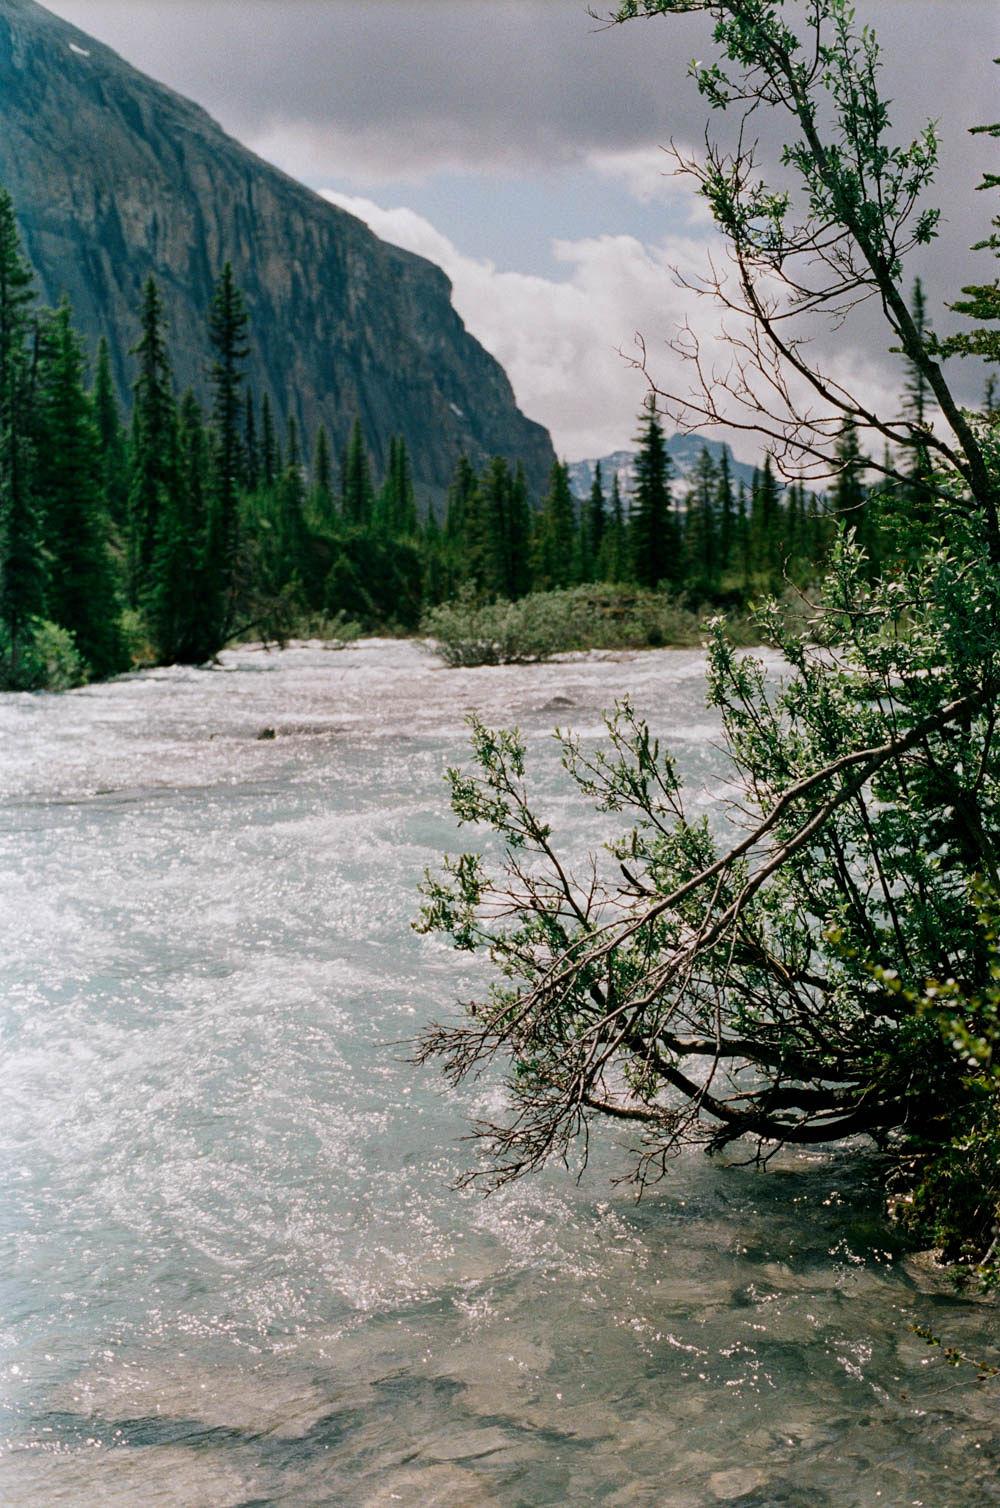 © Cottage Hill, LLC | cottagehill.co | Canadian Rockies17.jpg